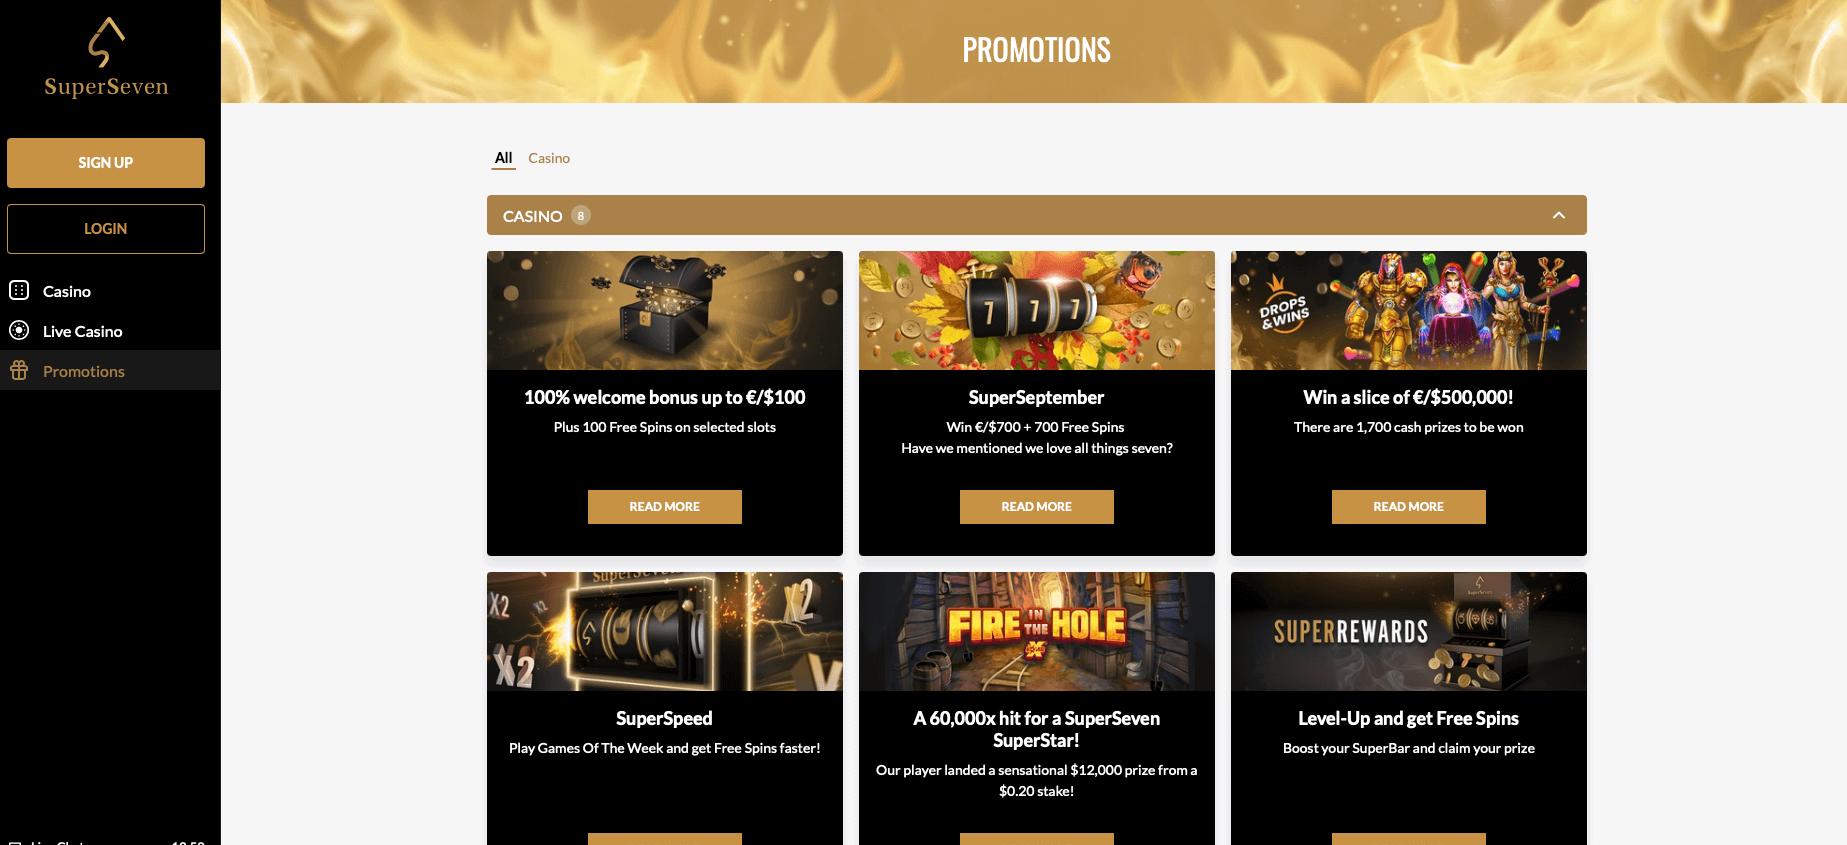 SuperSeven Casino: Kurzer Rückblick - Wöchentliche Slots-News